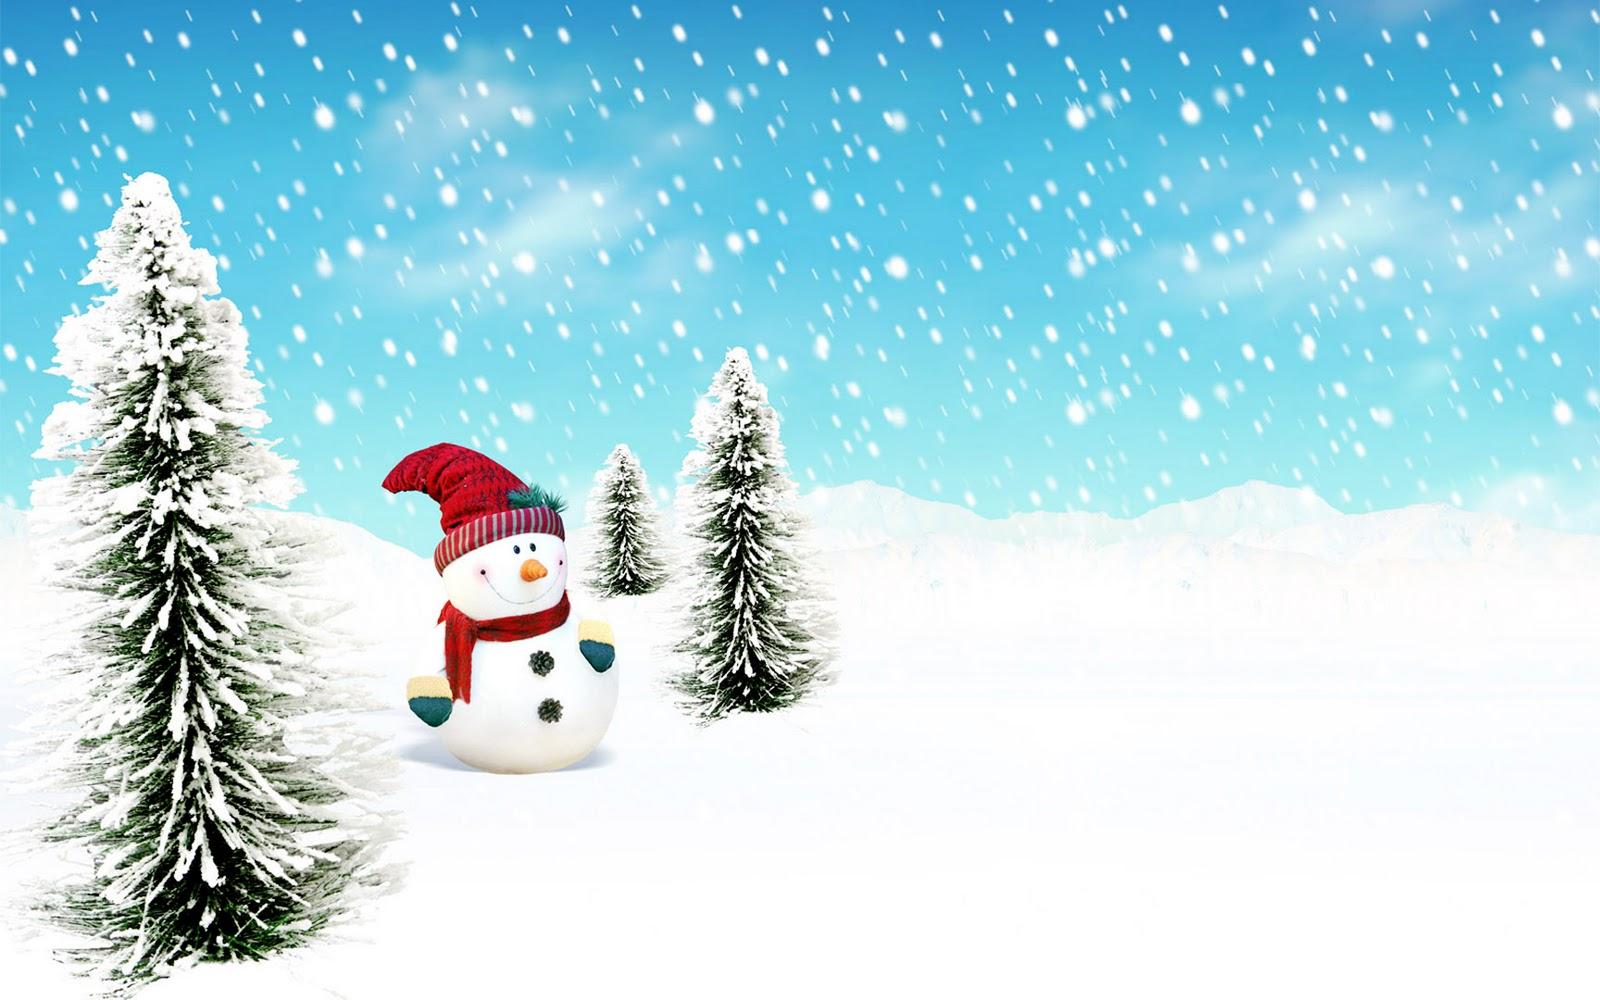 snowman wallpapers hd